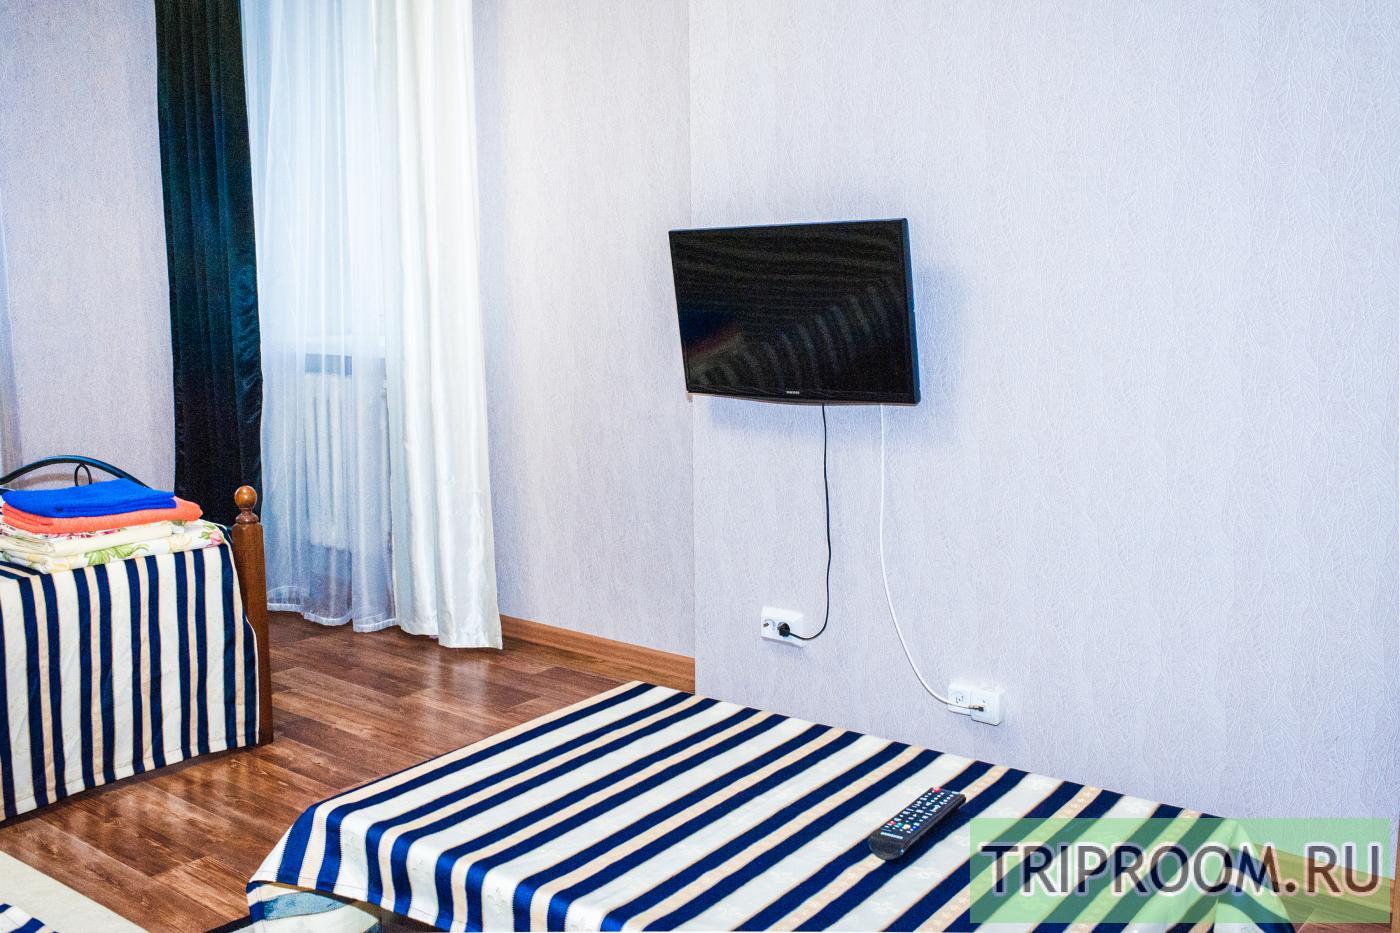 1-комнатная квартира посуточно (вариант № 11815), ул. Петра Смородина улица, фото № 2